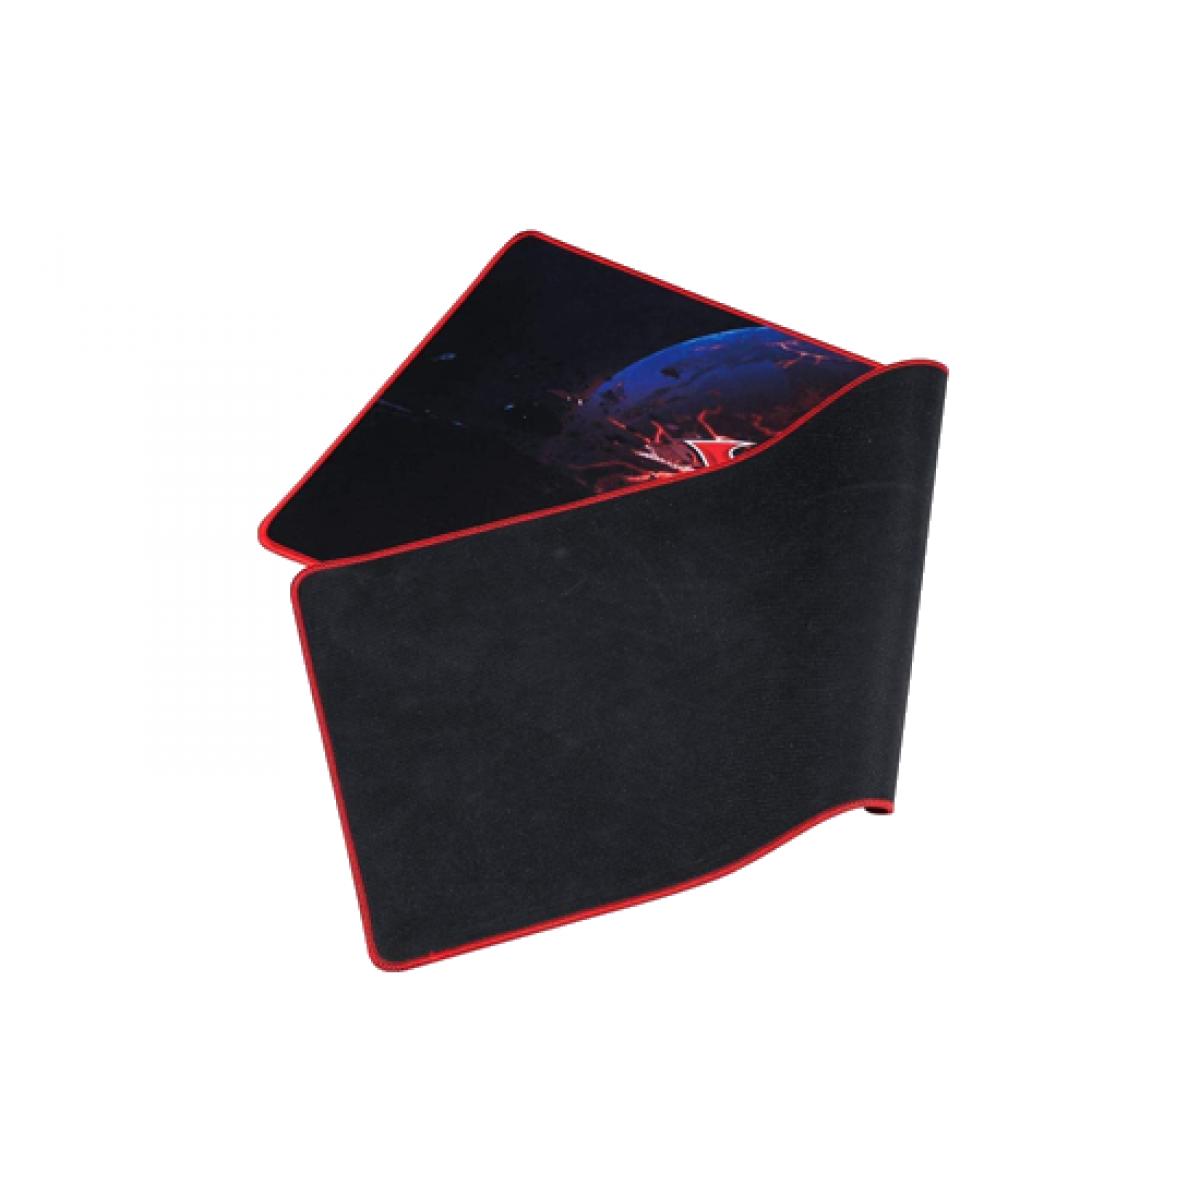 Mousepad Gamer XTRIKE-ME MP-204, Grande, Prova D'agua, Black/Red, MP204